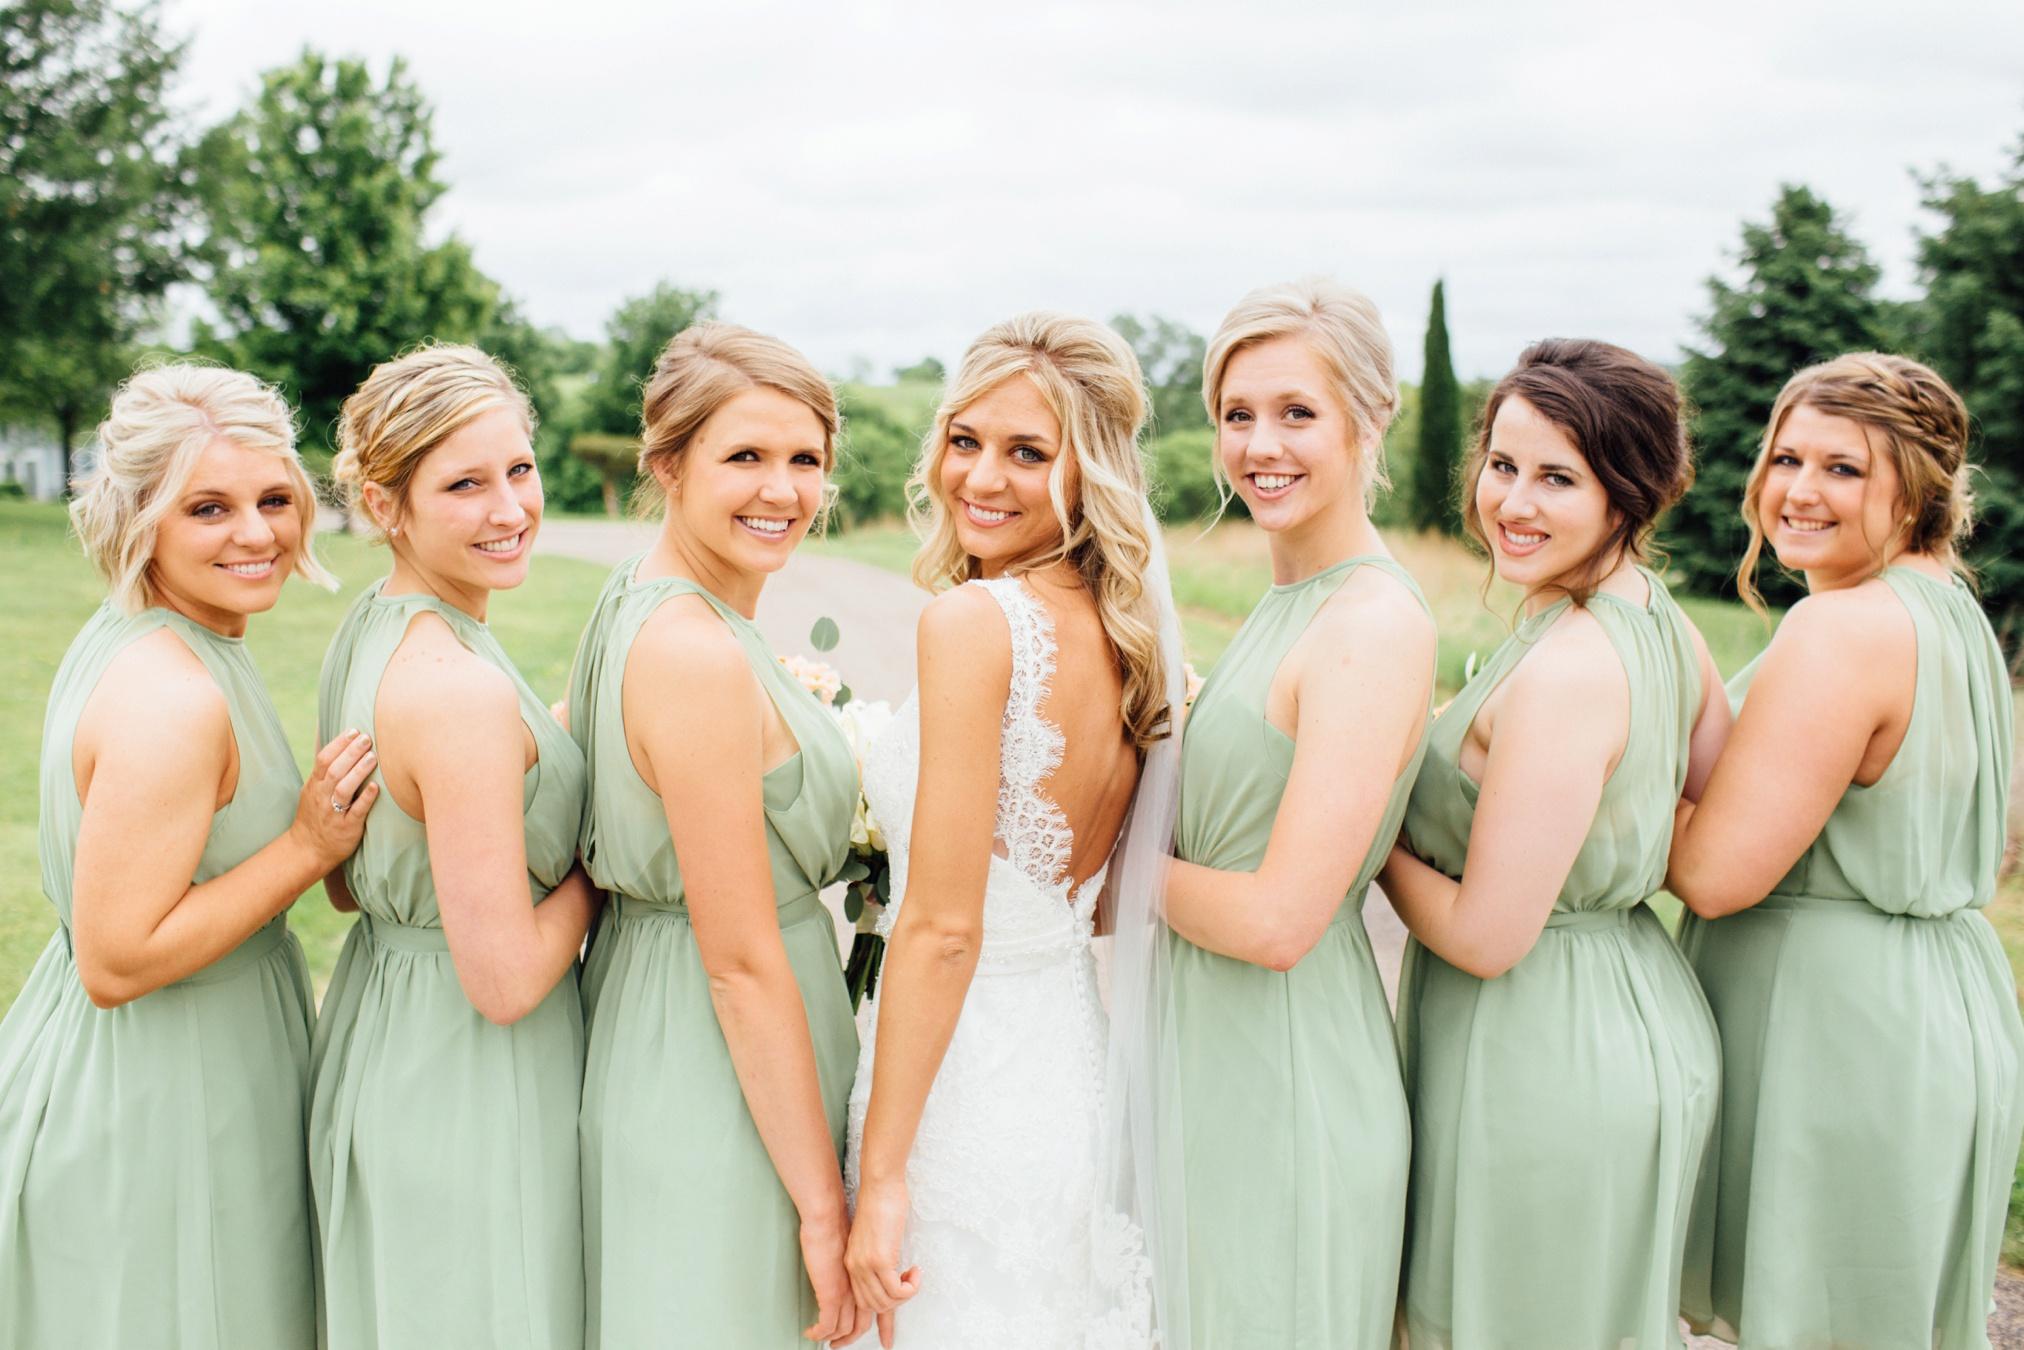 schmid_wedding-144.jpg